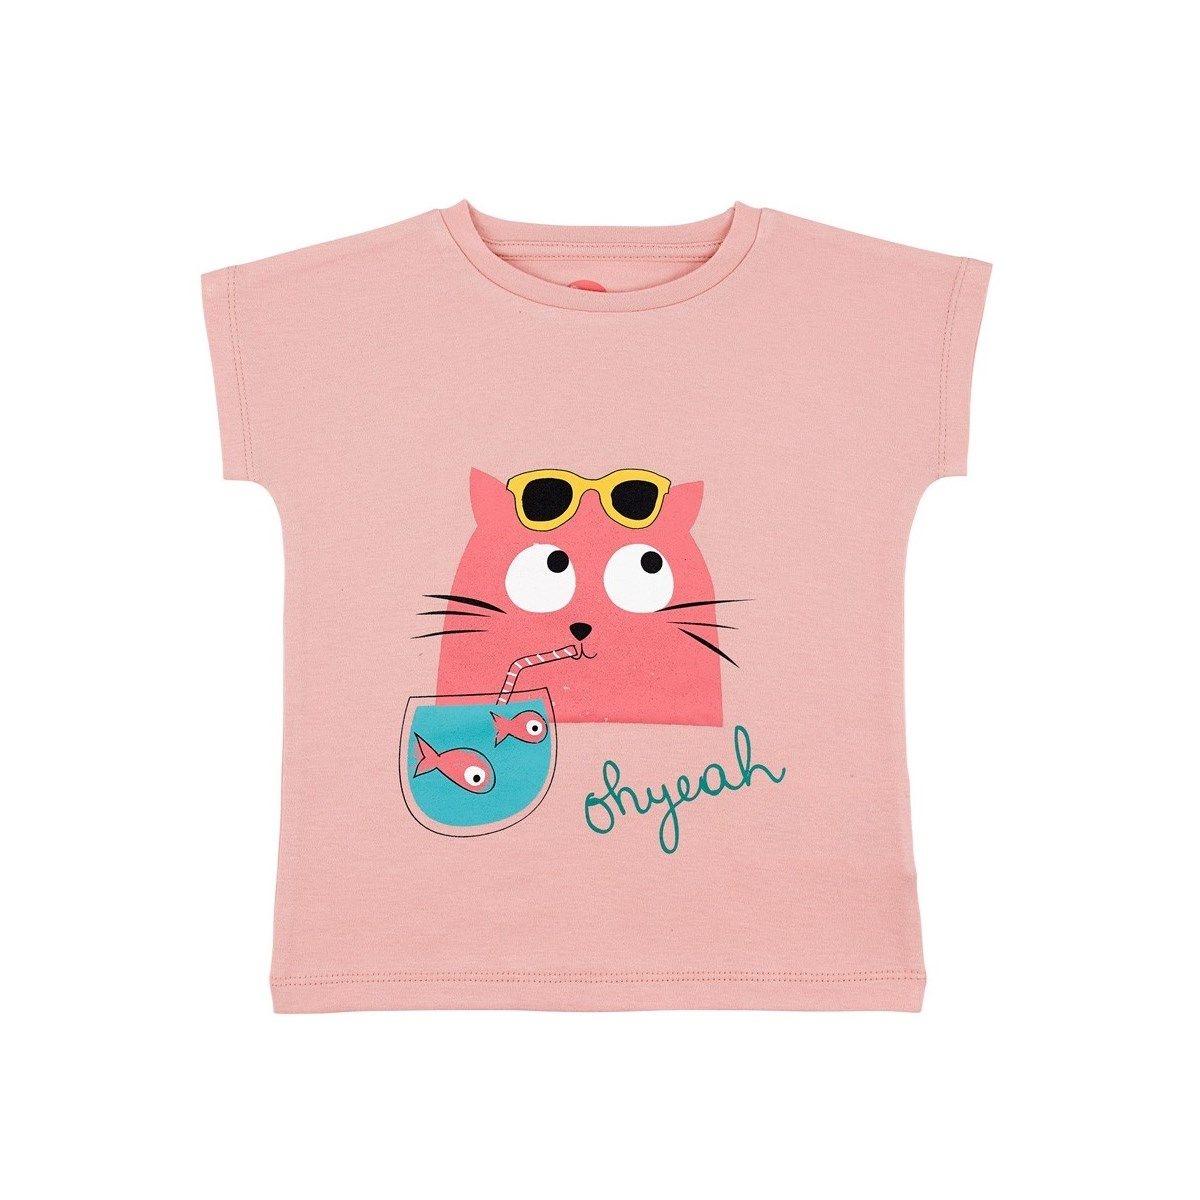 T-shirt Ohyeah 100% Coton Bio